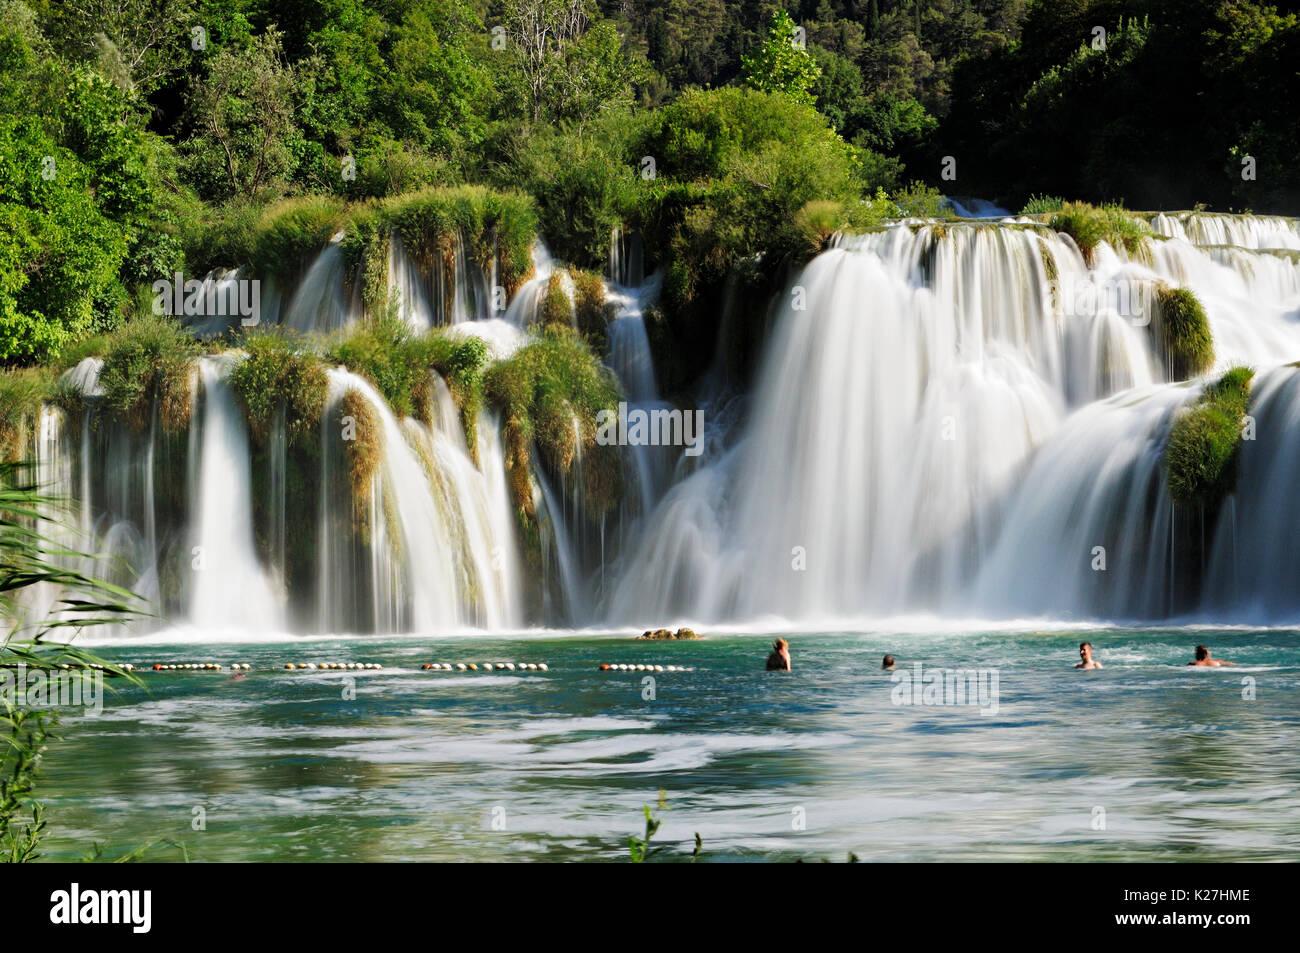 Majestic waterfalls in Krka National Park, Croatia Stock Photo